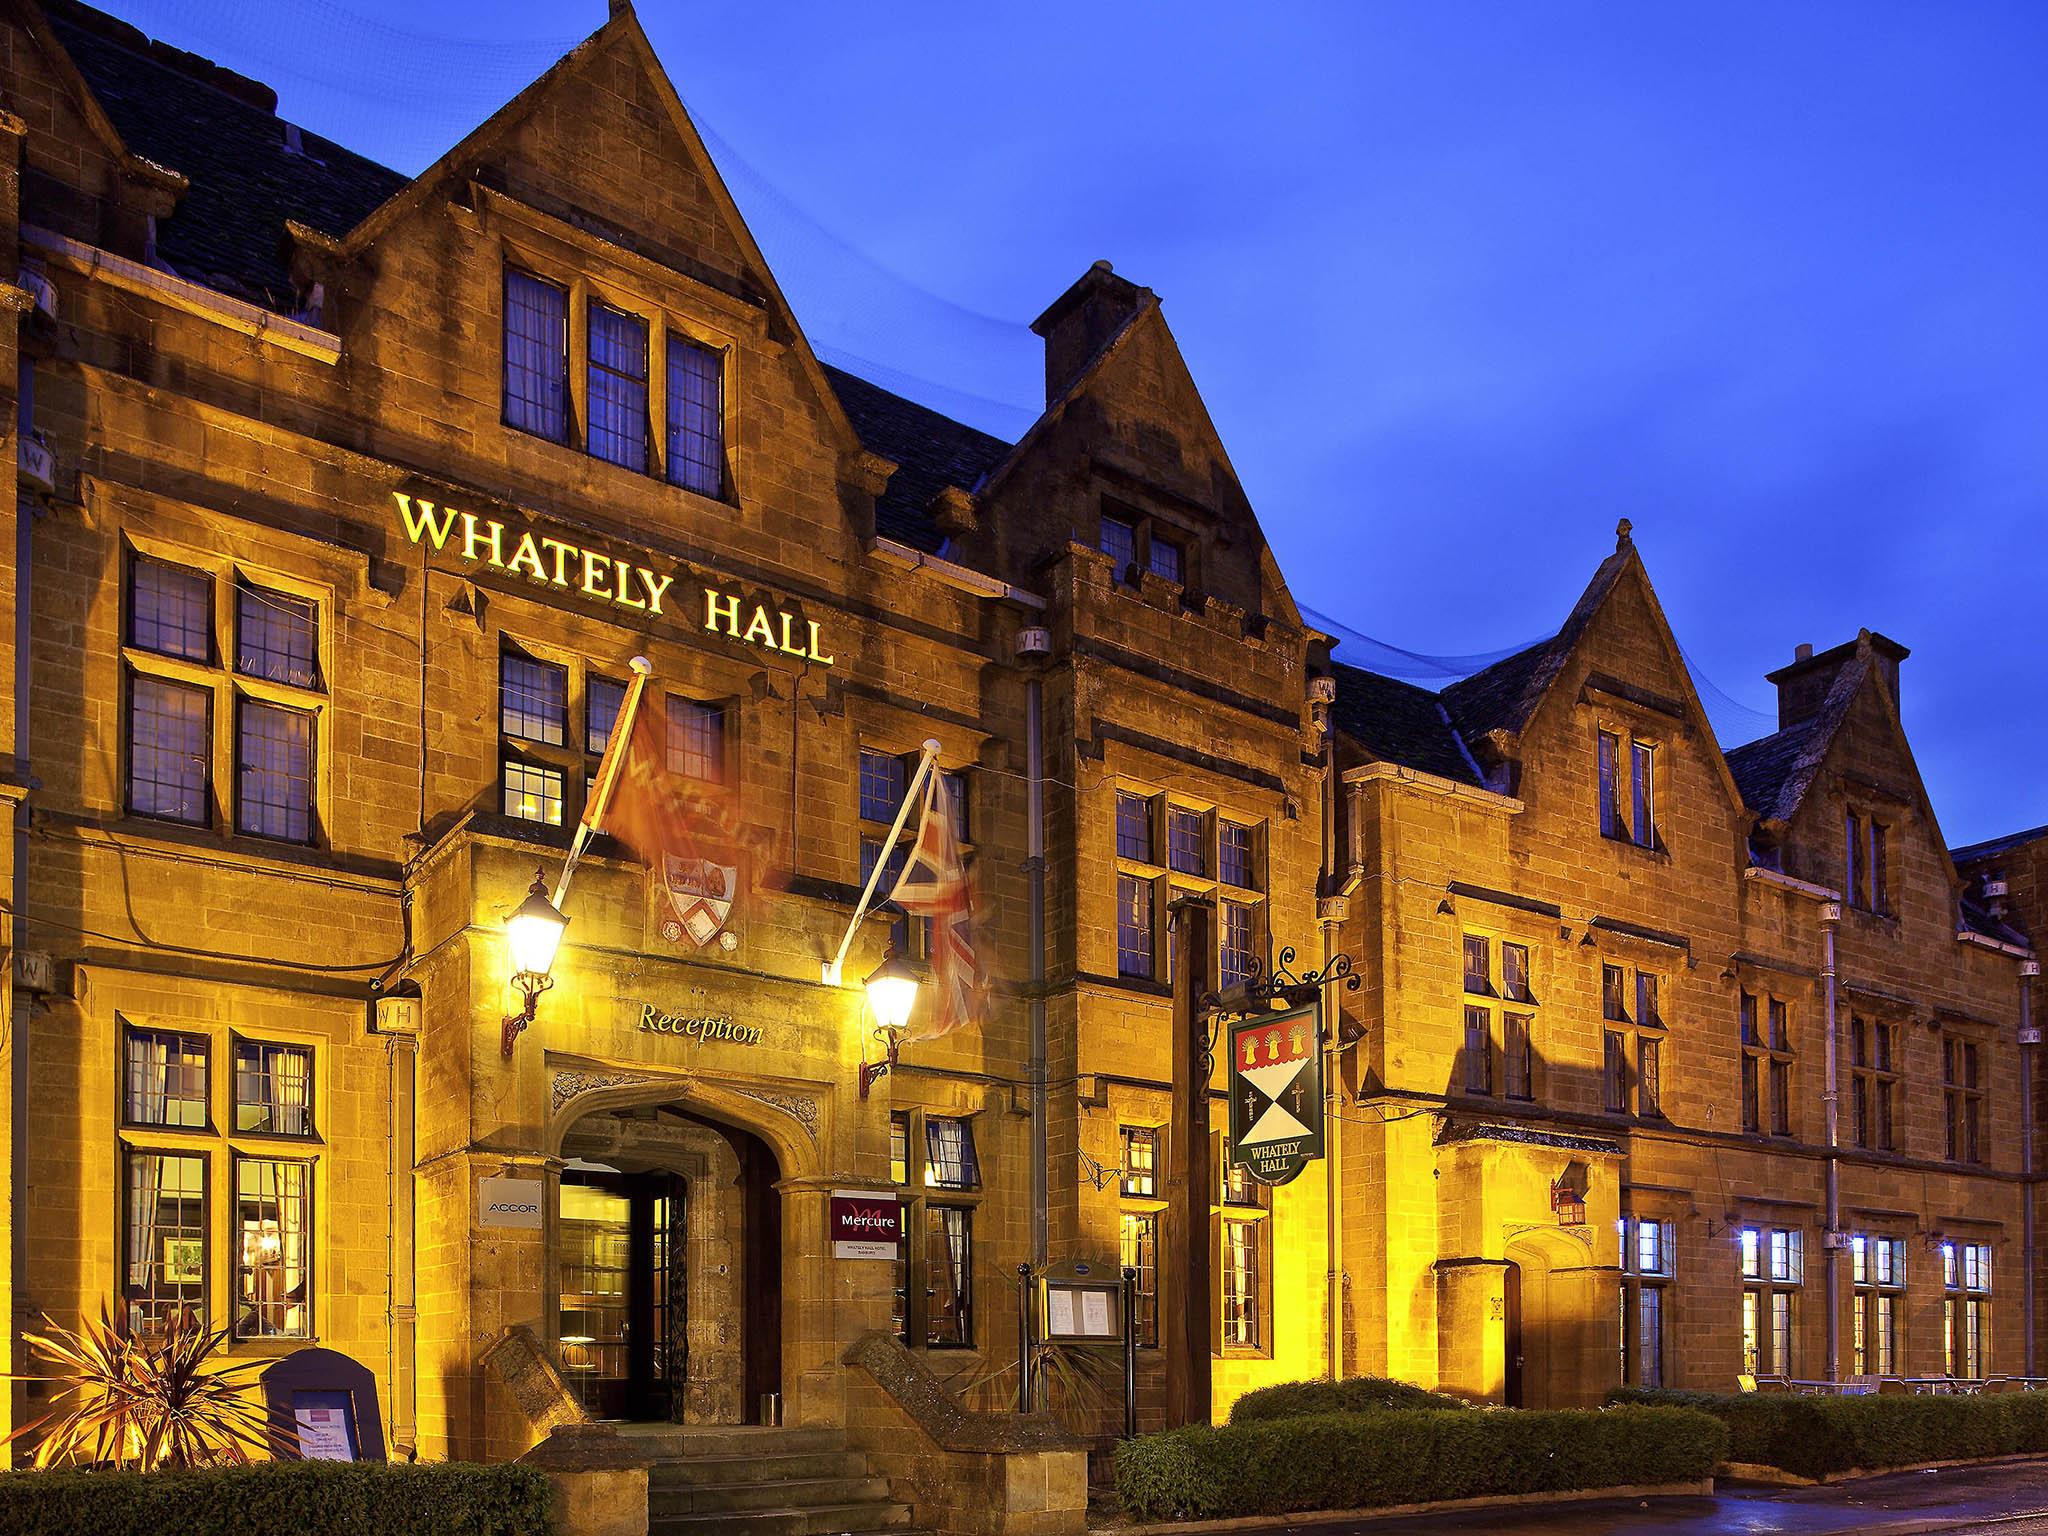 Hotel – Mercure Banbury Whately Hall Hotel